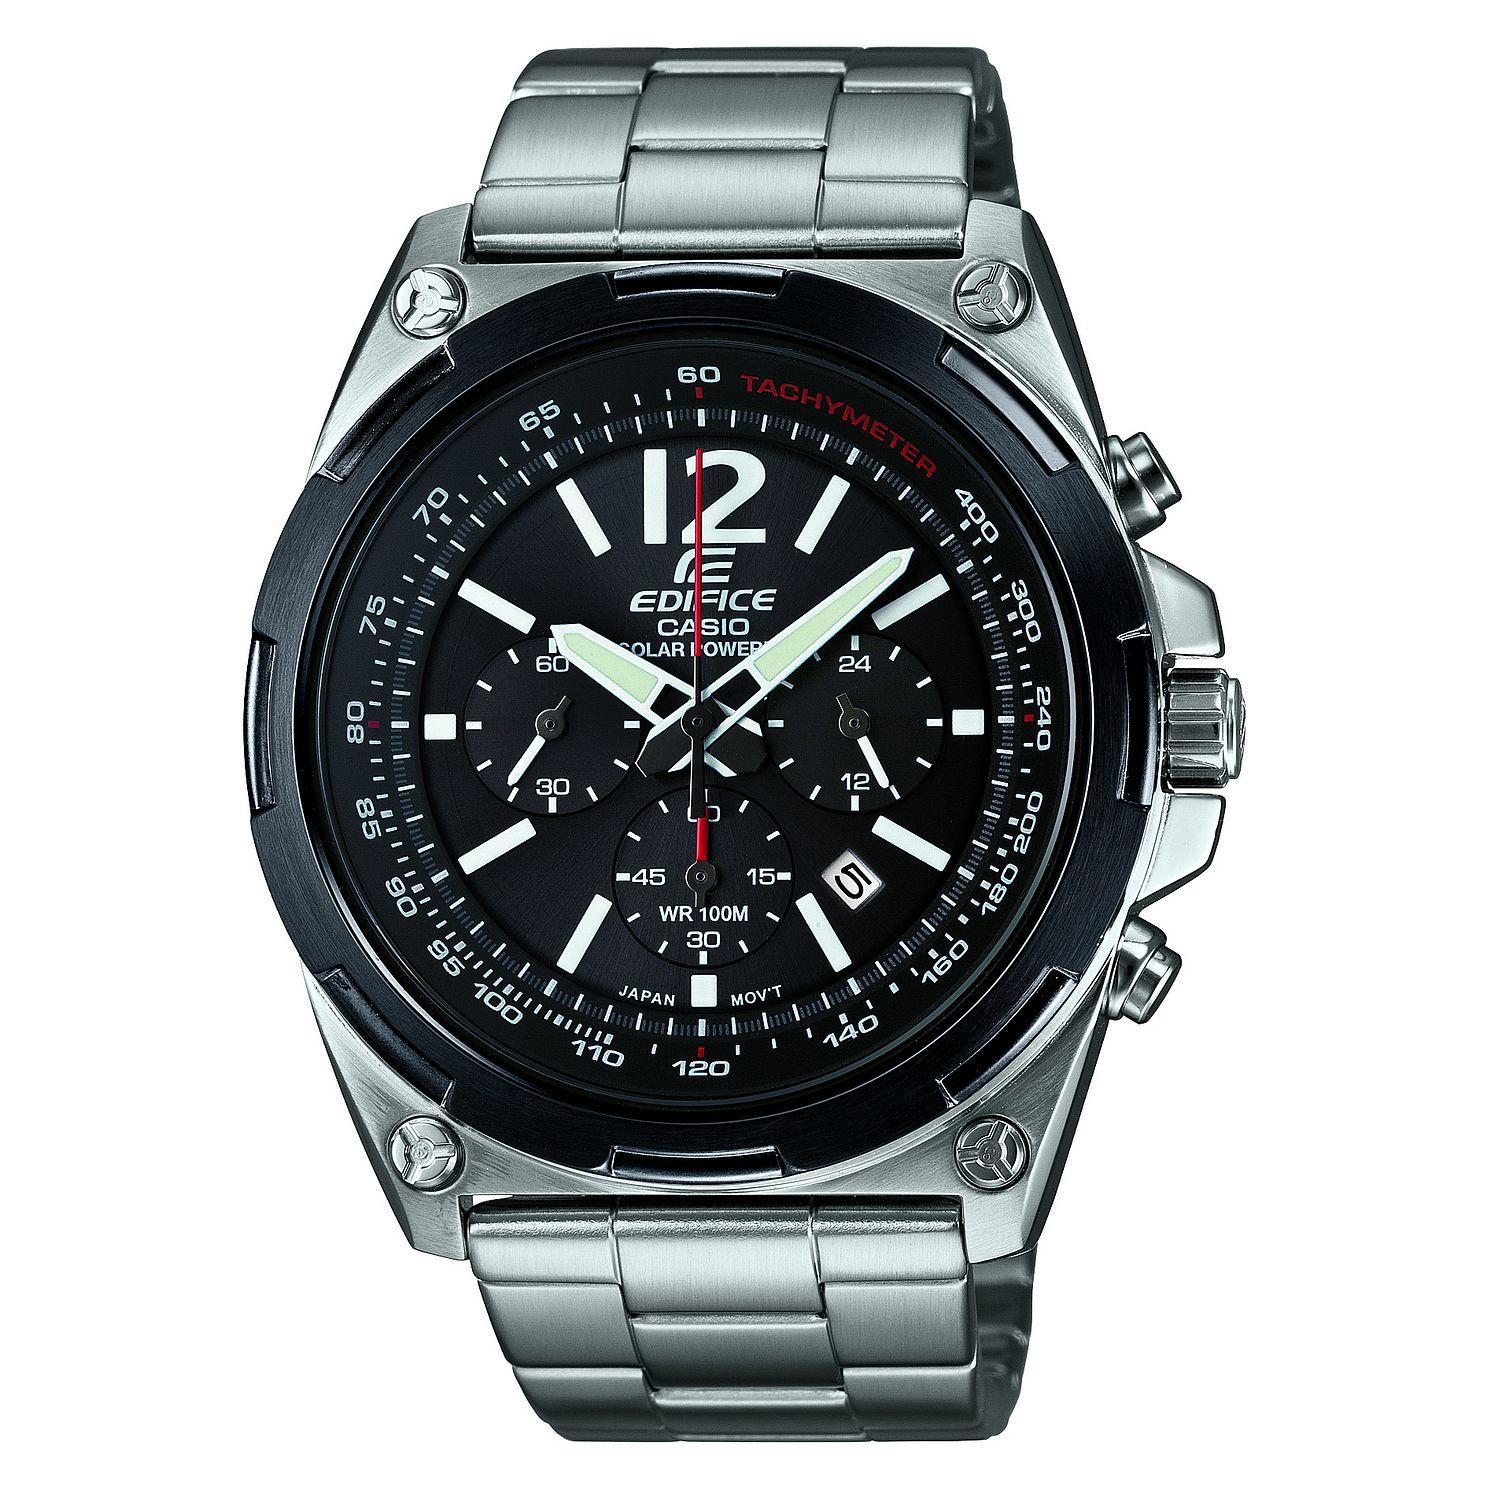 Mens Casio Edifice Chronograph Solar Powered Watch £106.25 at H.Samuel